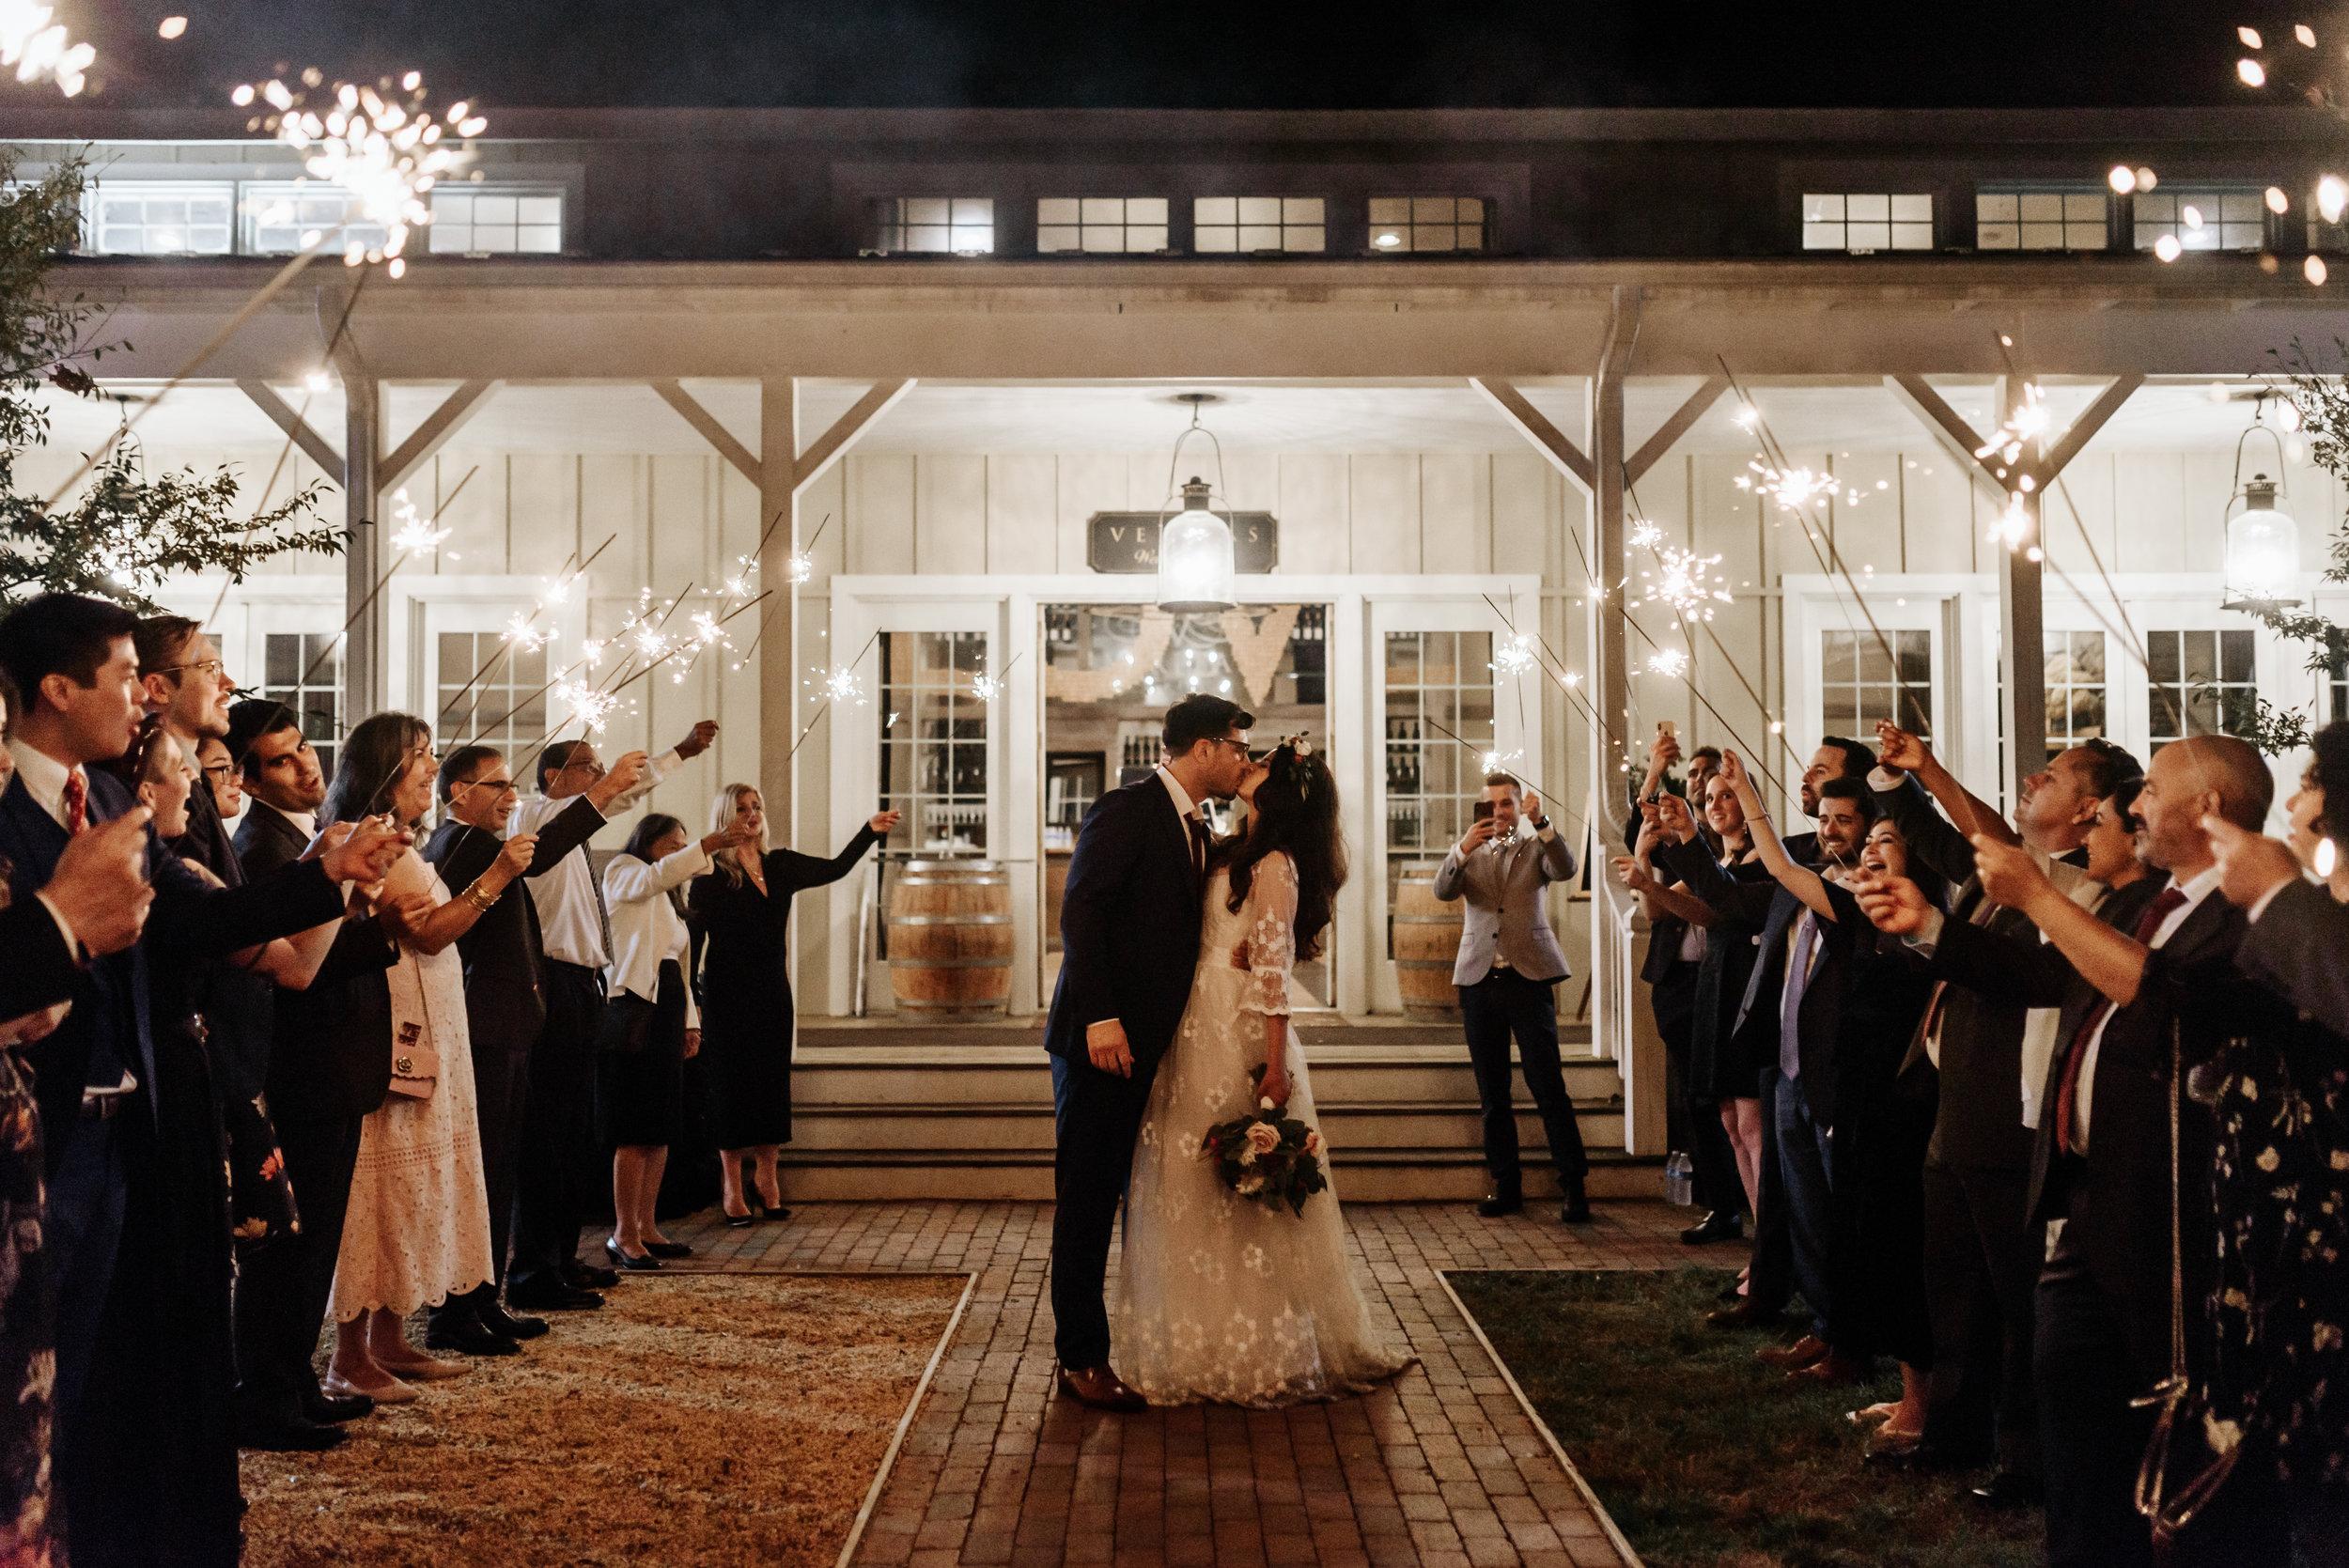 Veritas-Vineyards-and-Winery-Wedding-Photography-Afton-Virginia-Yasmin-Seth-Photography-by-V-9931.jpg